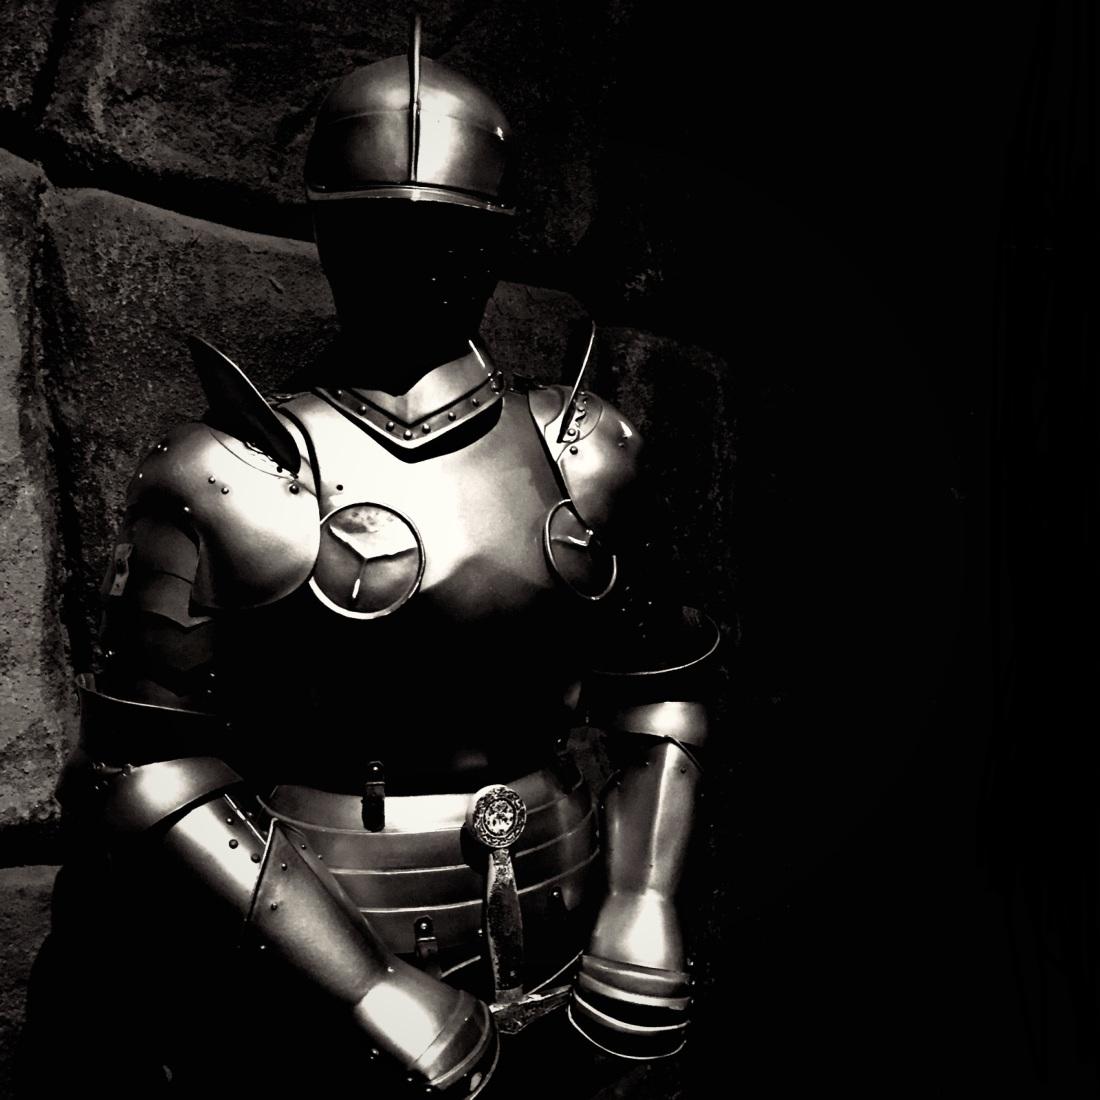 knight-1500223